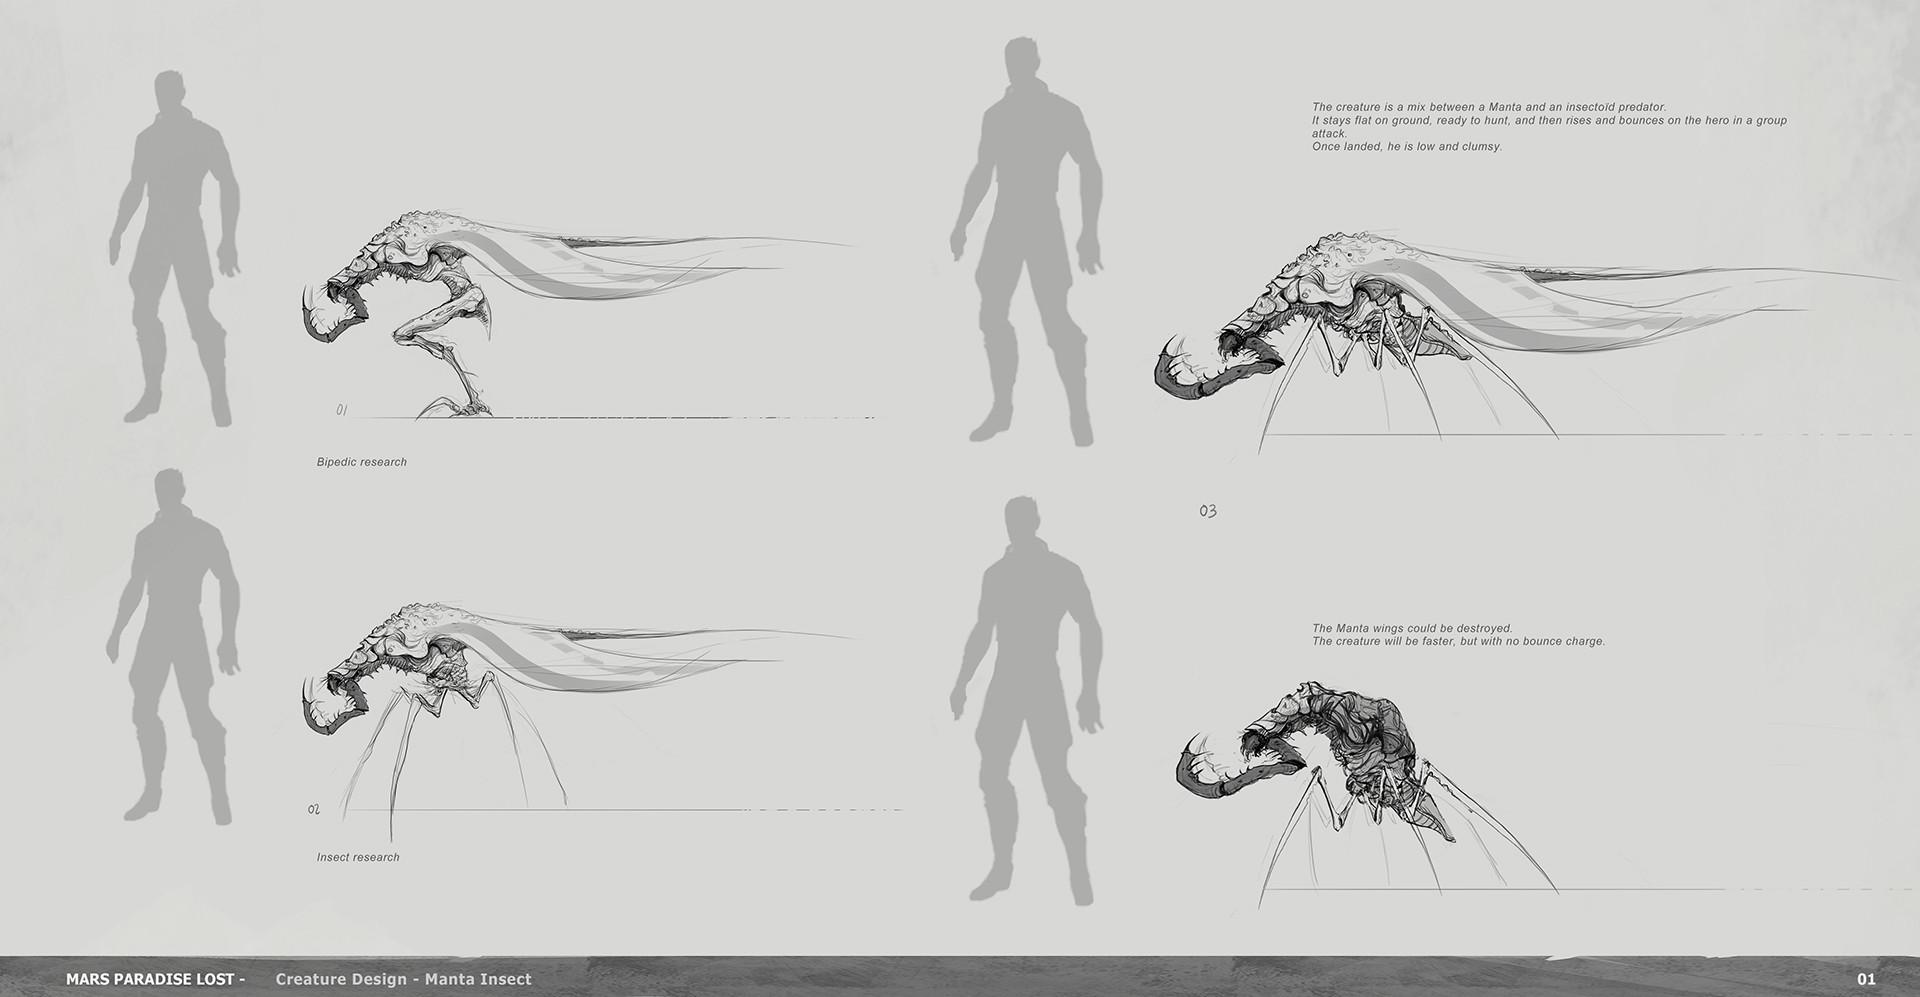 Alexandre chaudret mpl creature manta insect research01